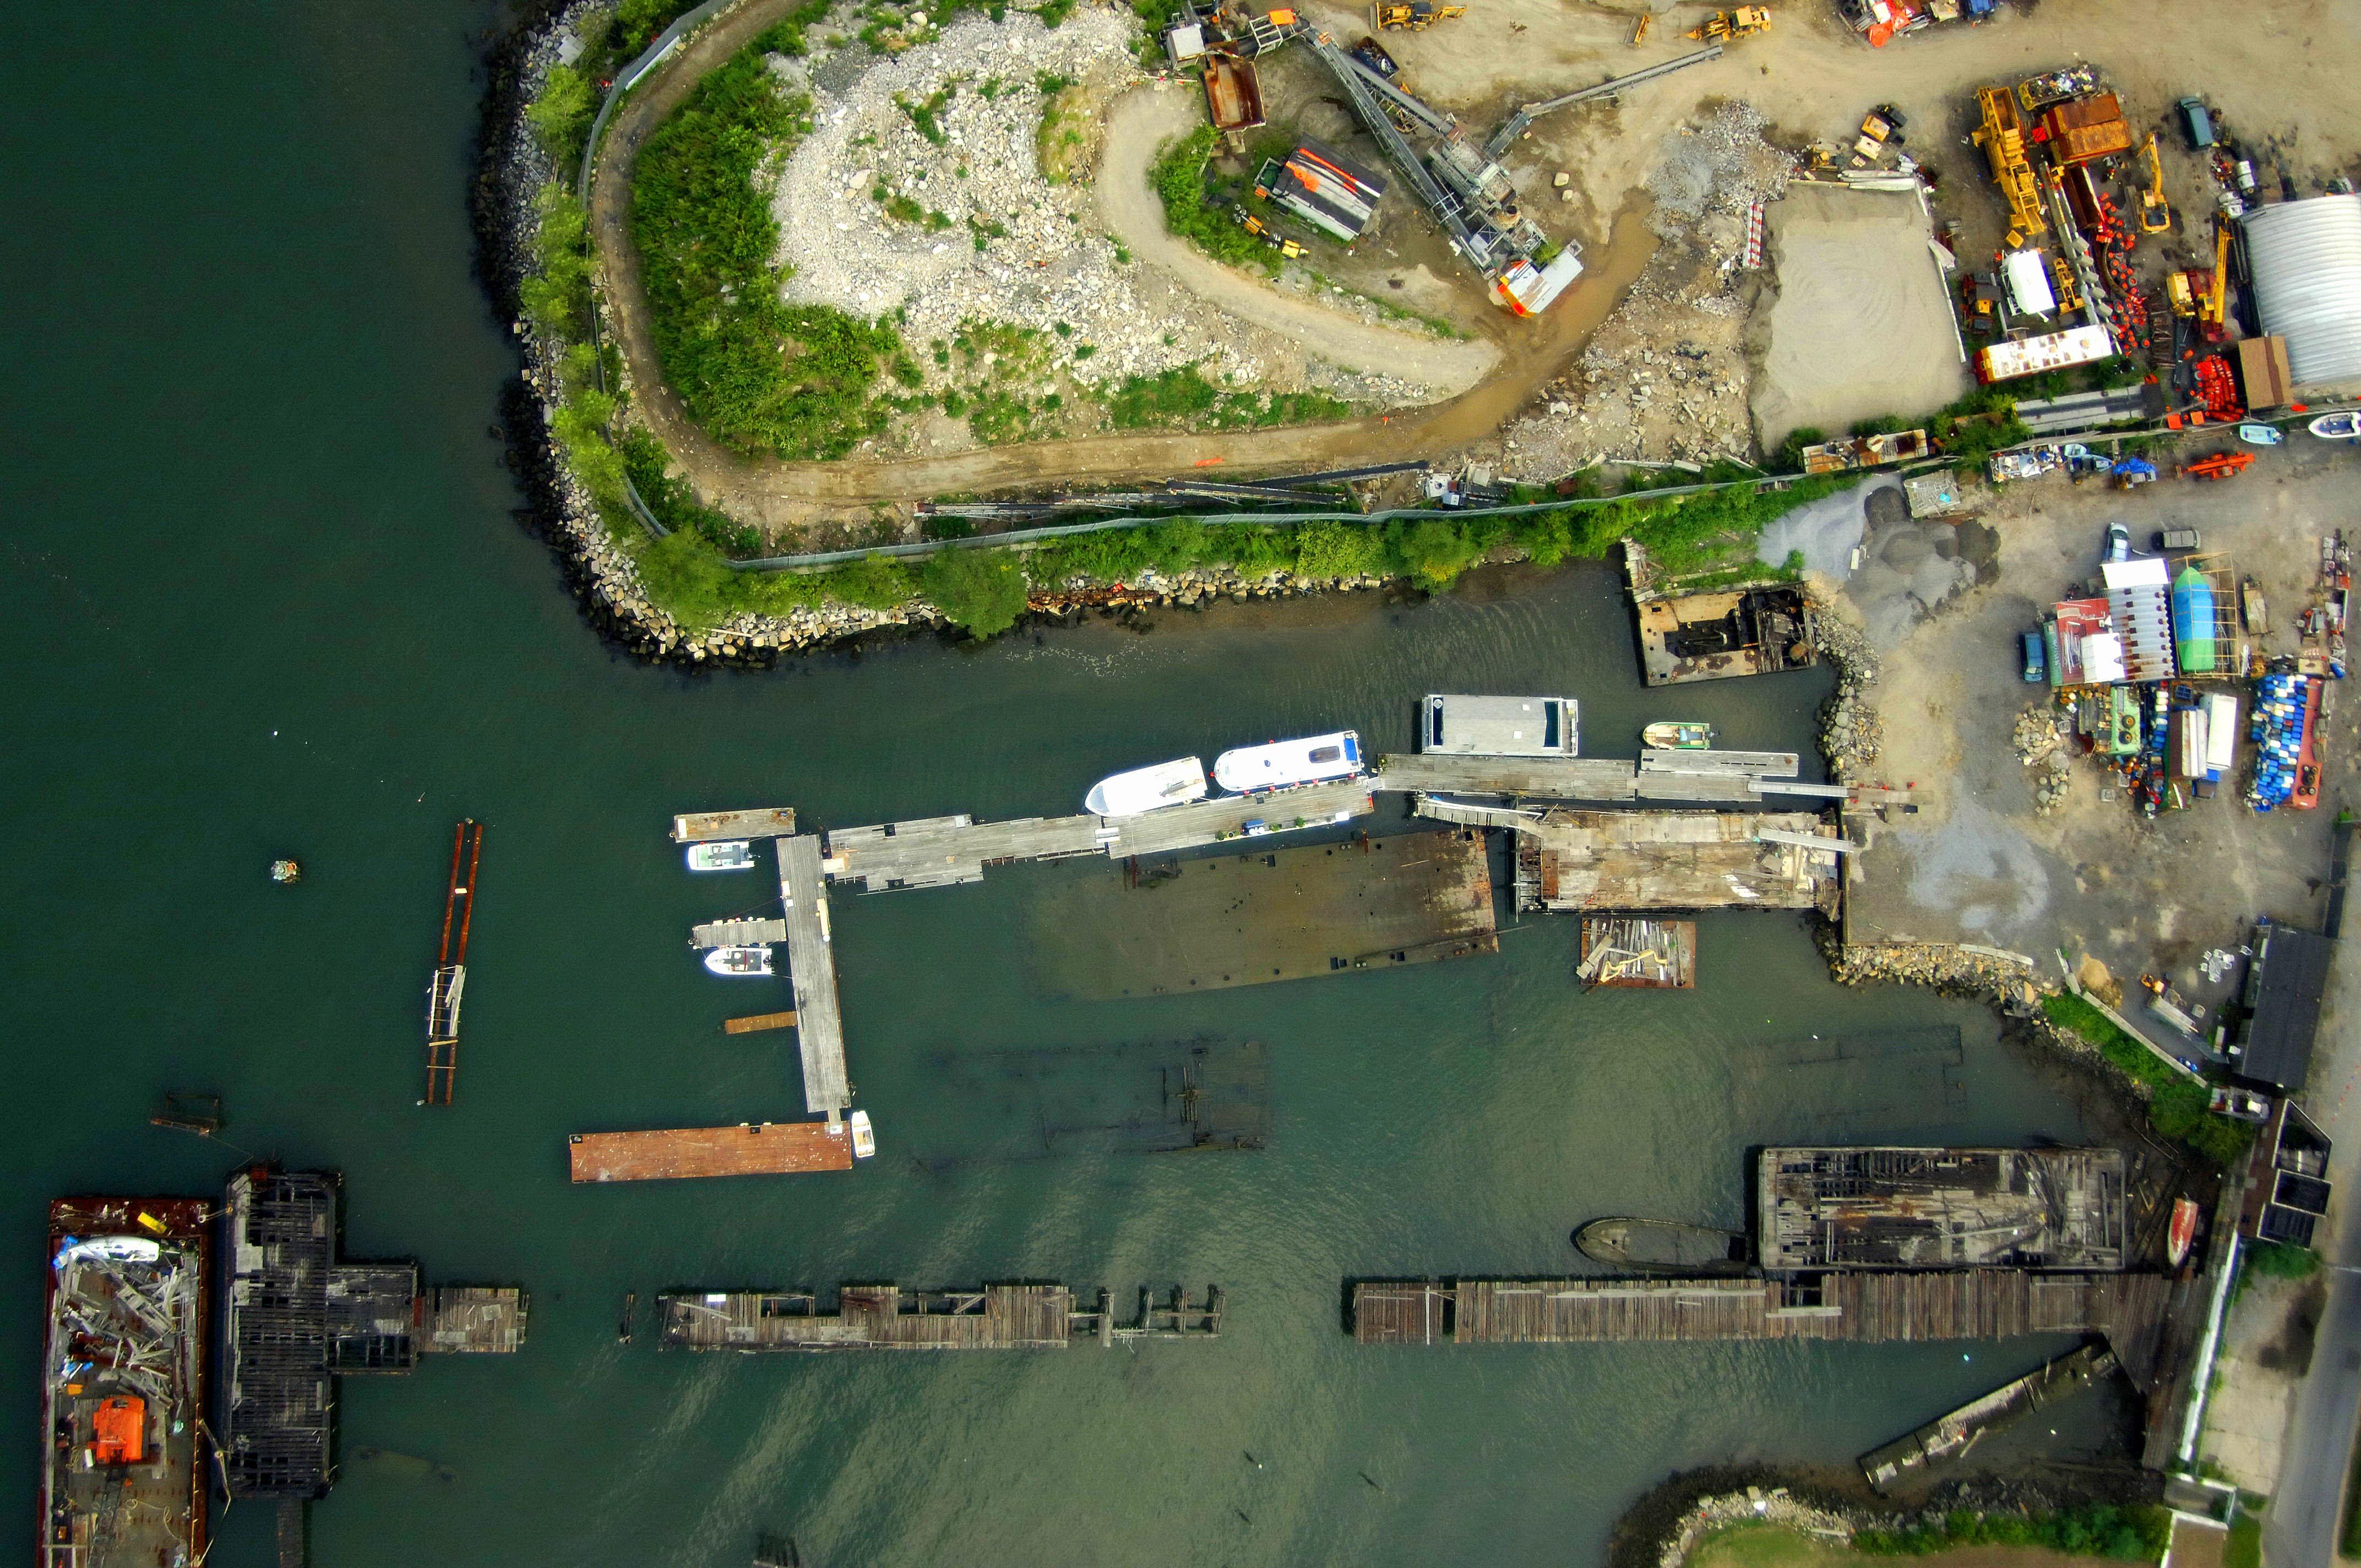 Whitestone Marine Amp Watersports Center In Whitestone NY